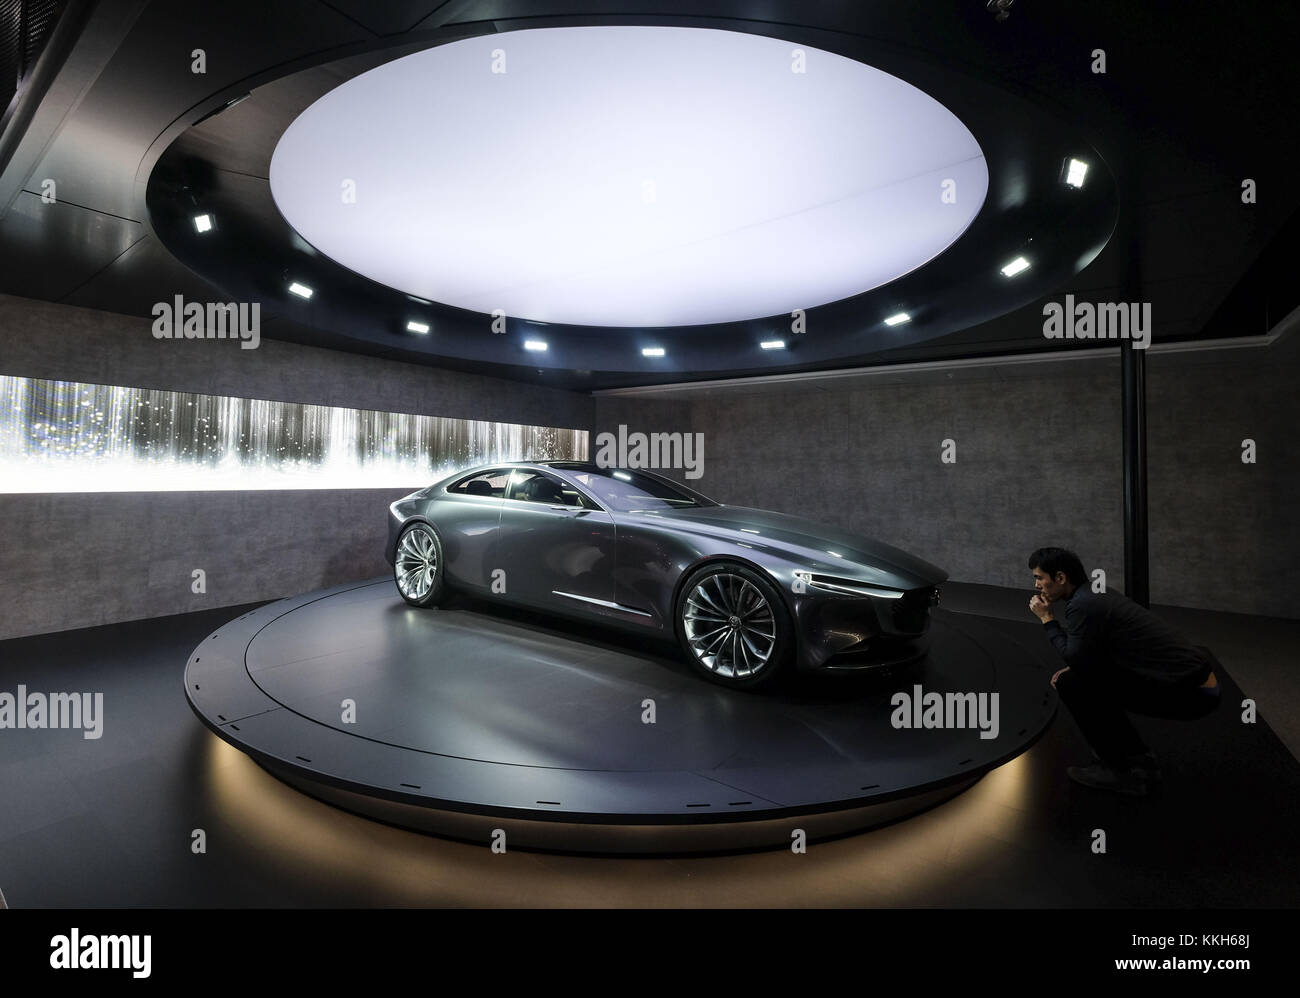 https://c8.alamy.com/comp/KKH68J/los-angeles-california-usa-30th-nov-2017-the-mazda-vision-coupe-concept-KKH68J.jpg